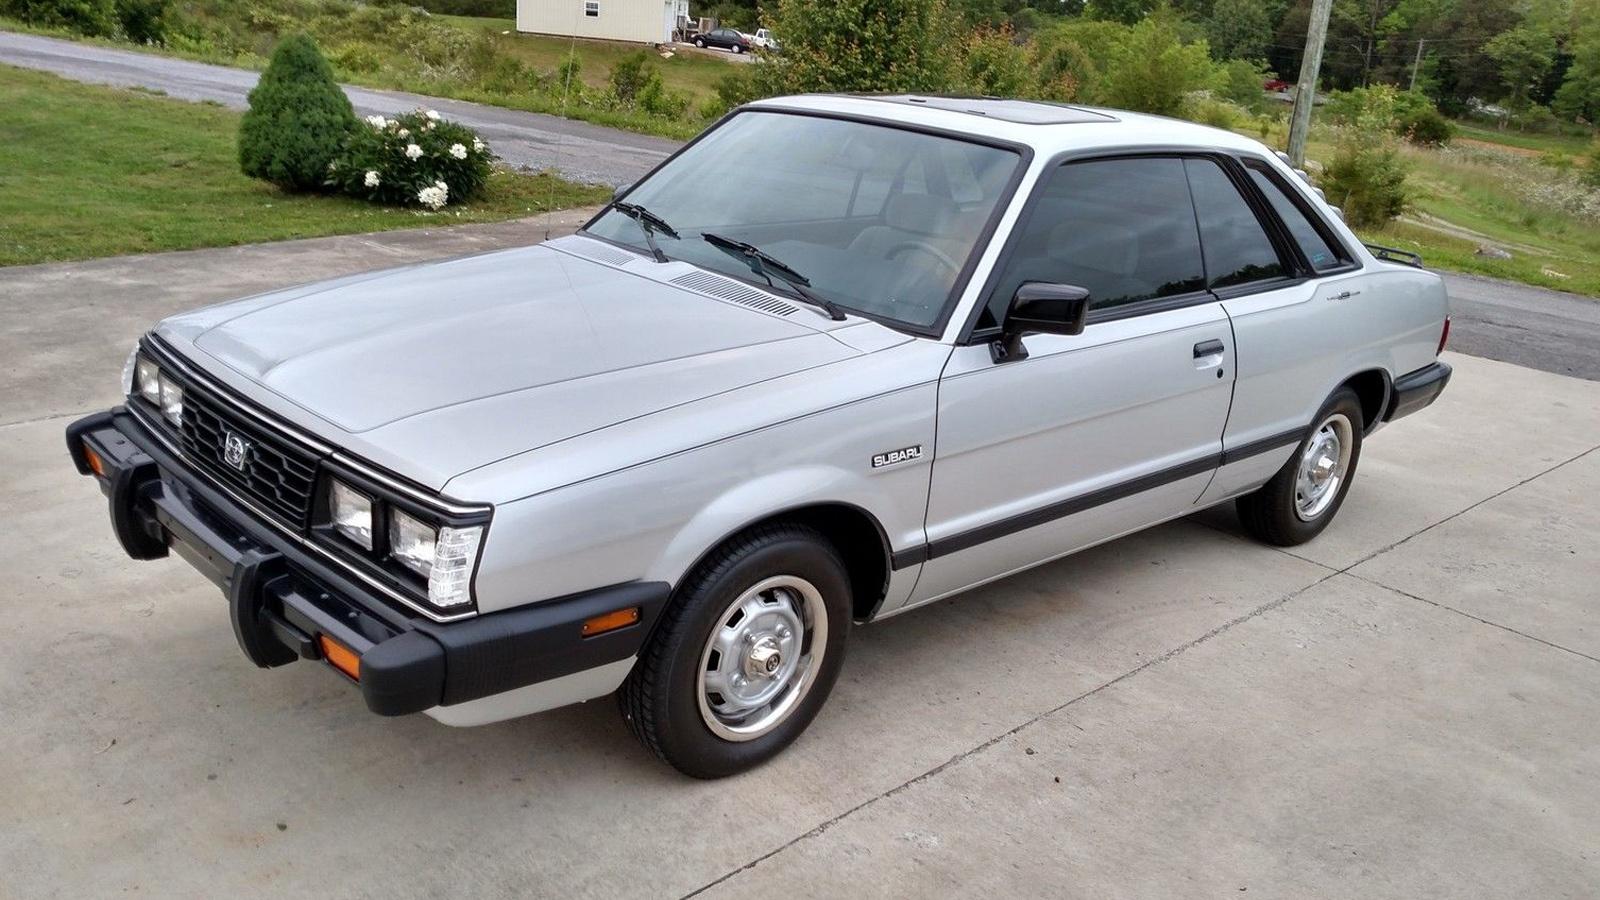 Subaru Leone II 1979 - 1984 Coupe #3